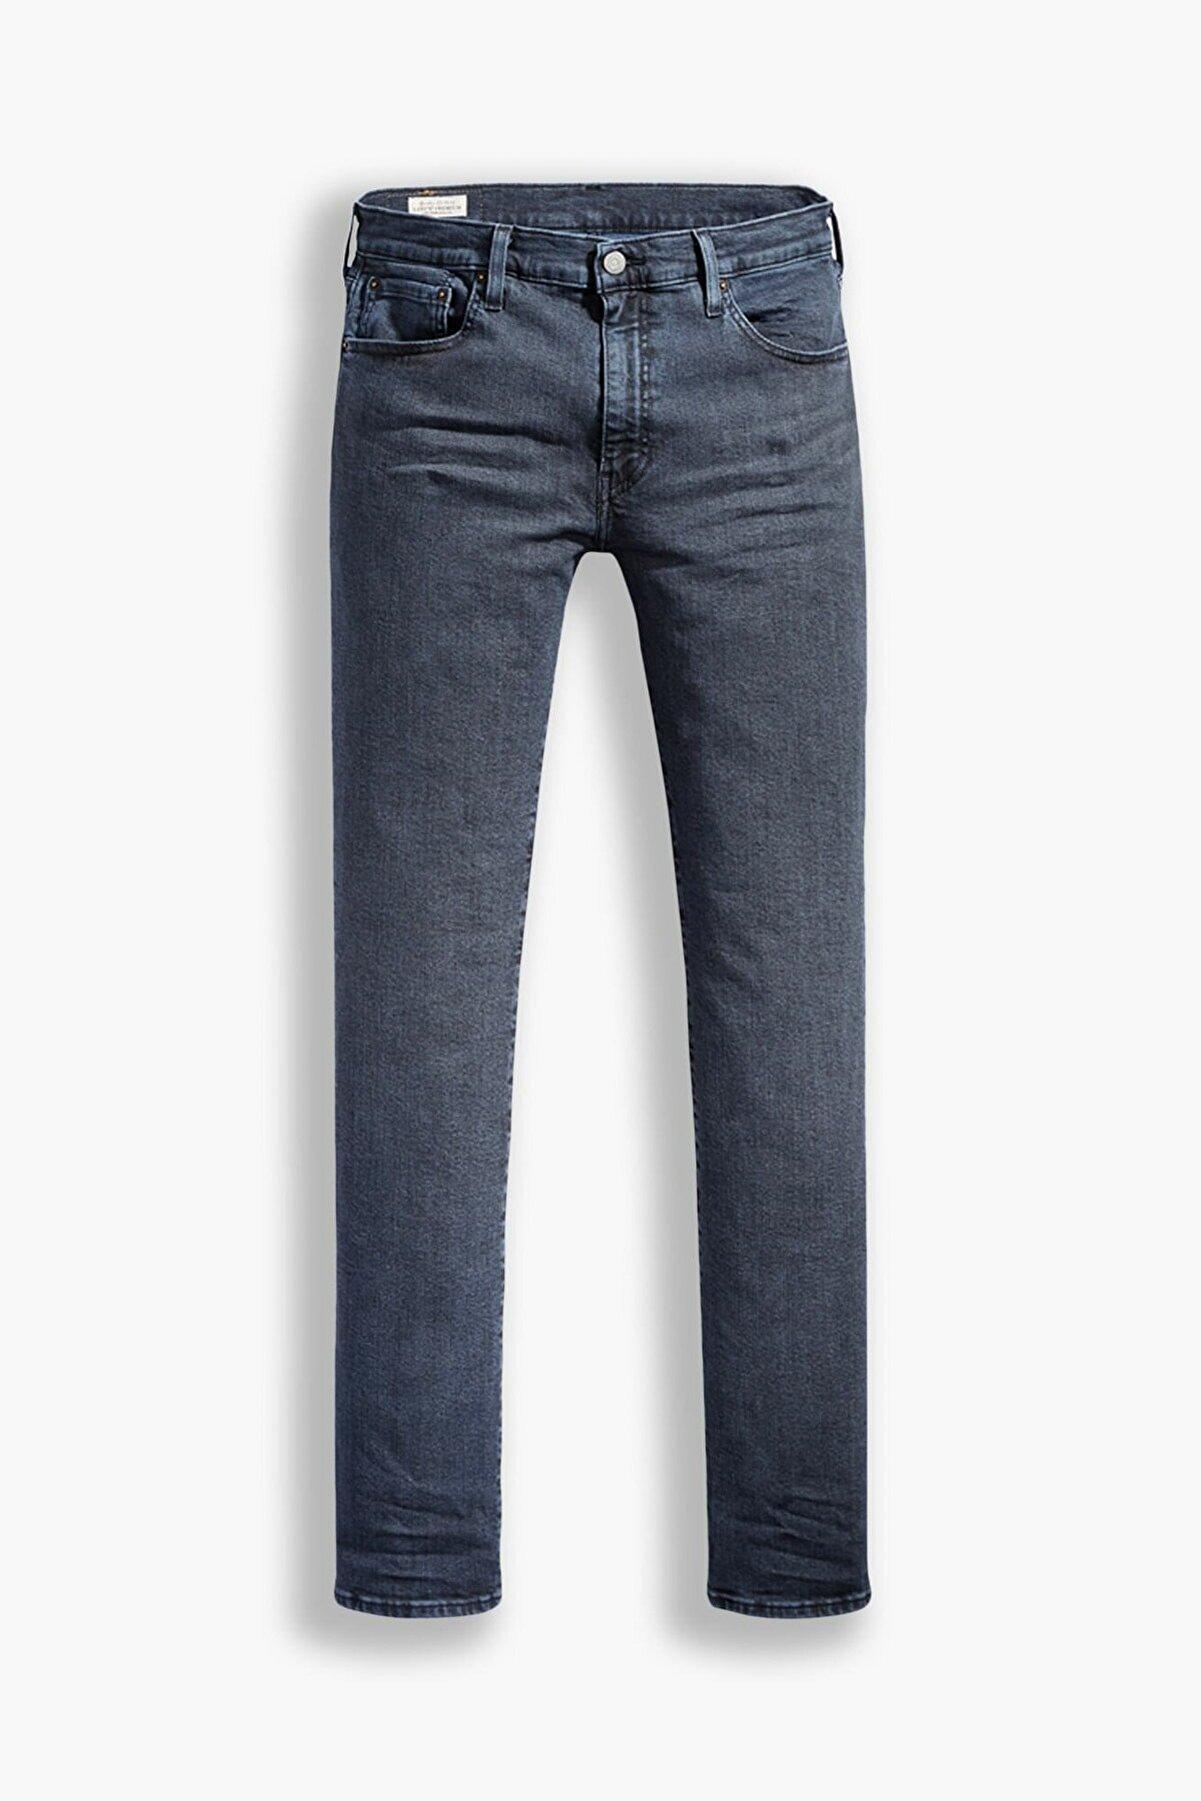 Levi's Erkek 502™ Regular Tapered Erkek Jean Pantolon-Richmond Blue Black Od Adv 2950710300